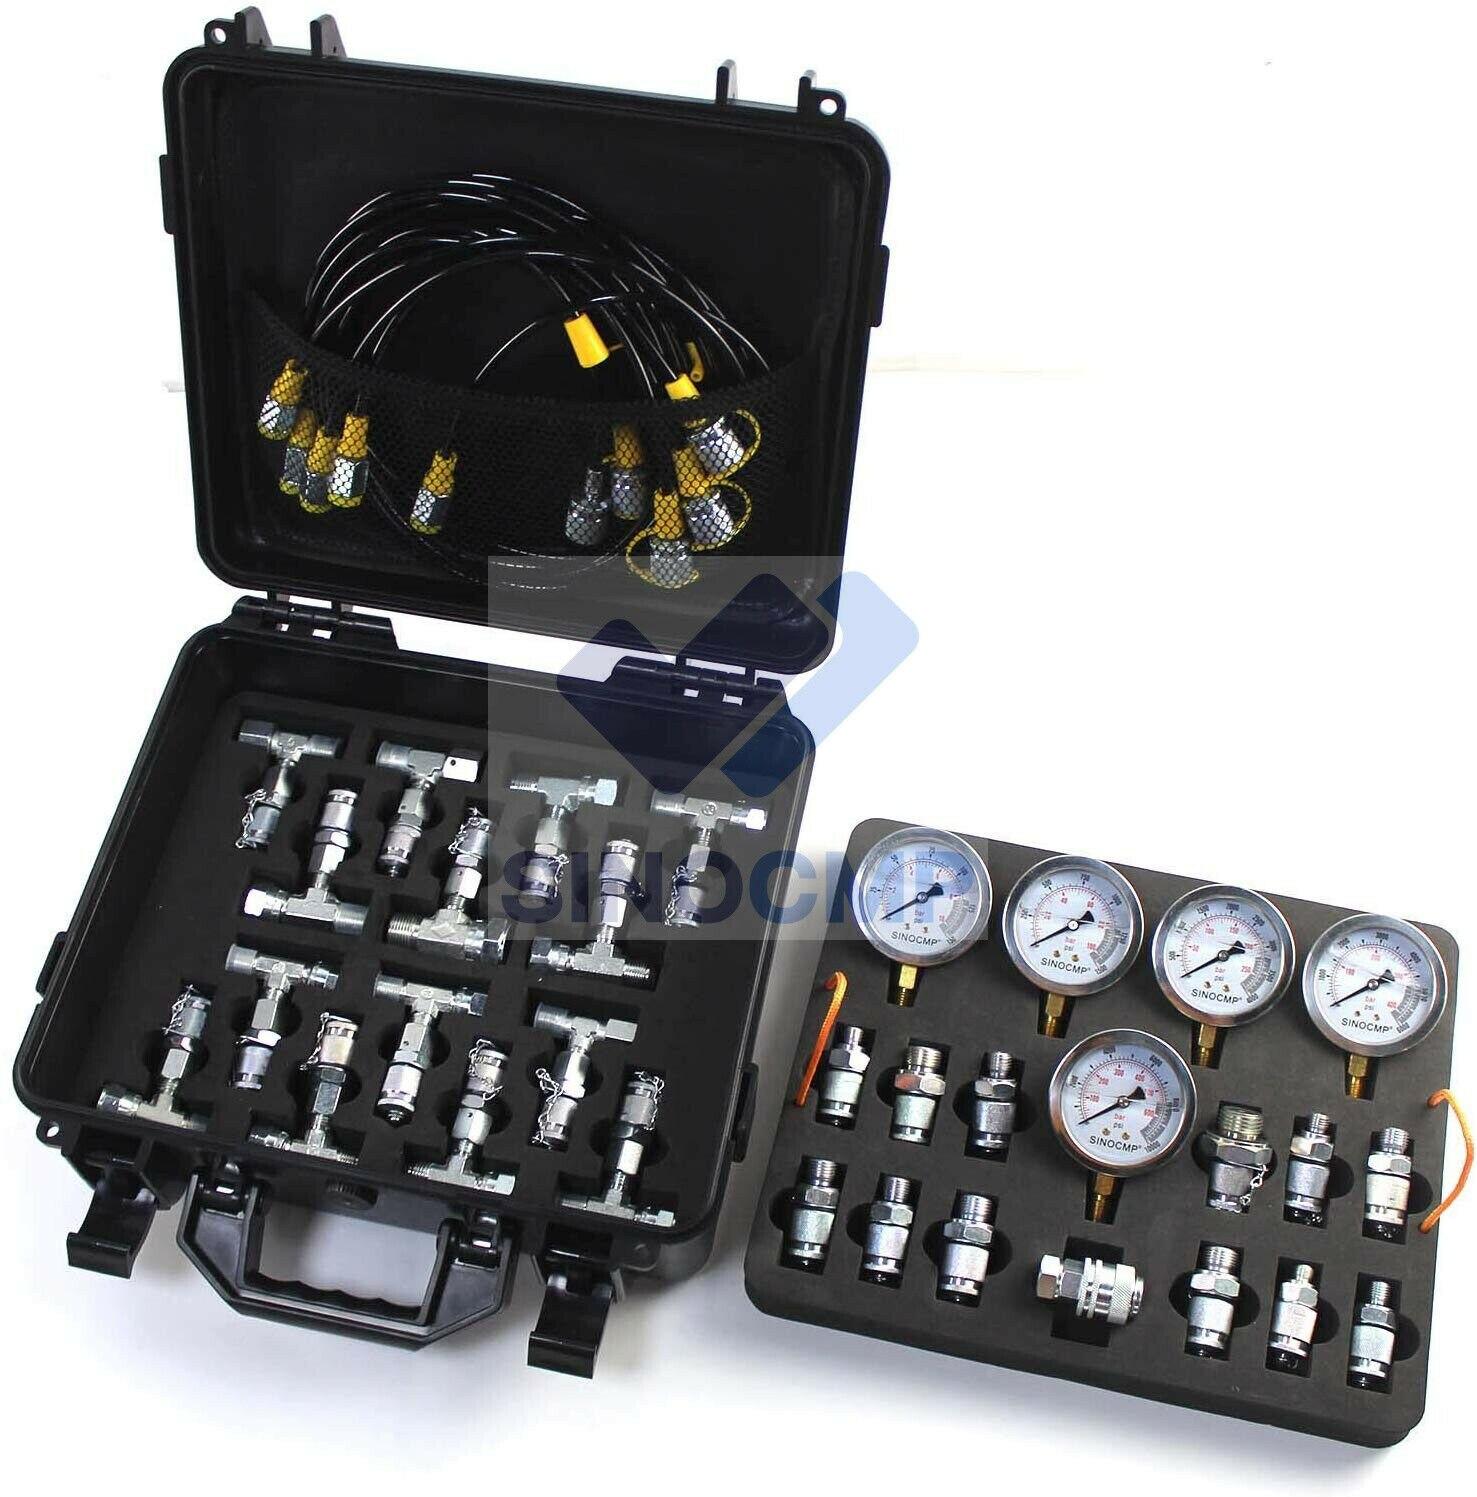 Hydraulic Test Coupling Point Kit for Excavators Caterpillar Komatsu 15-Sets